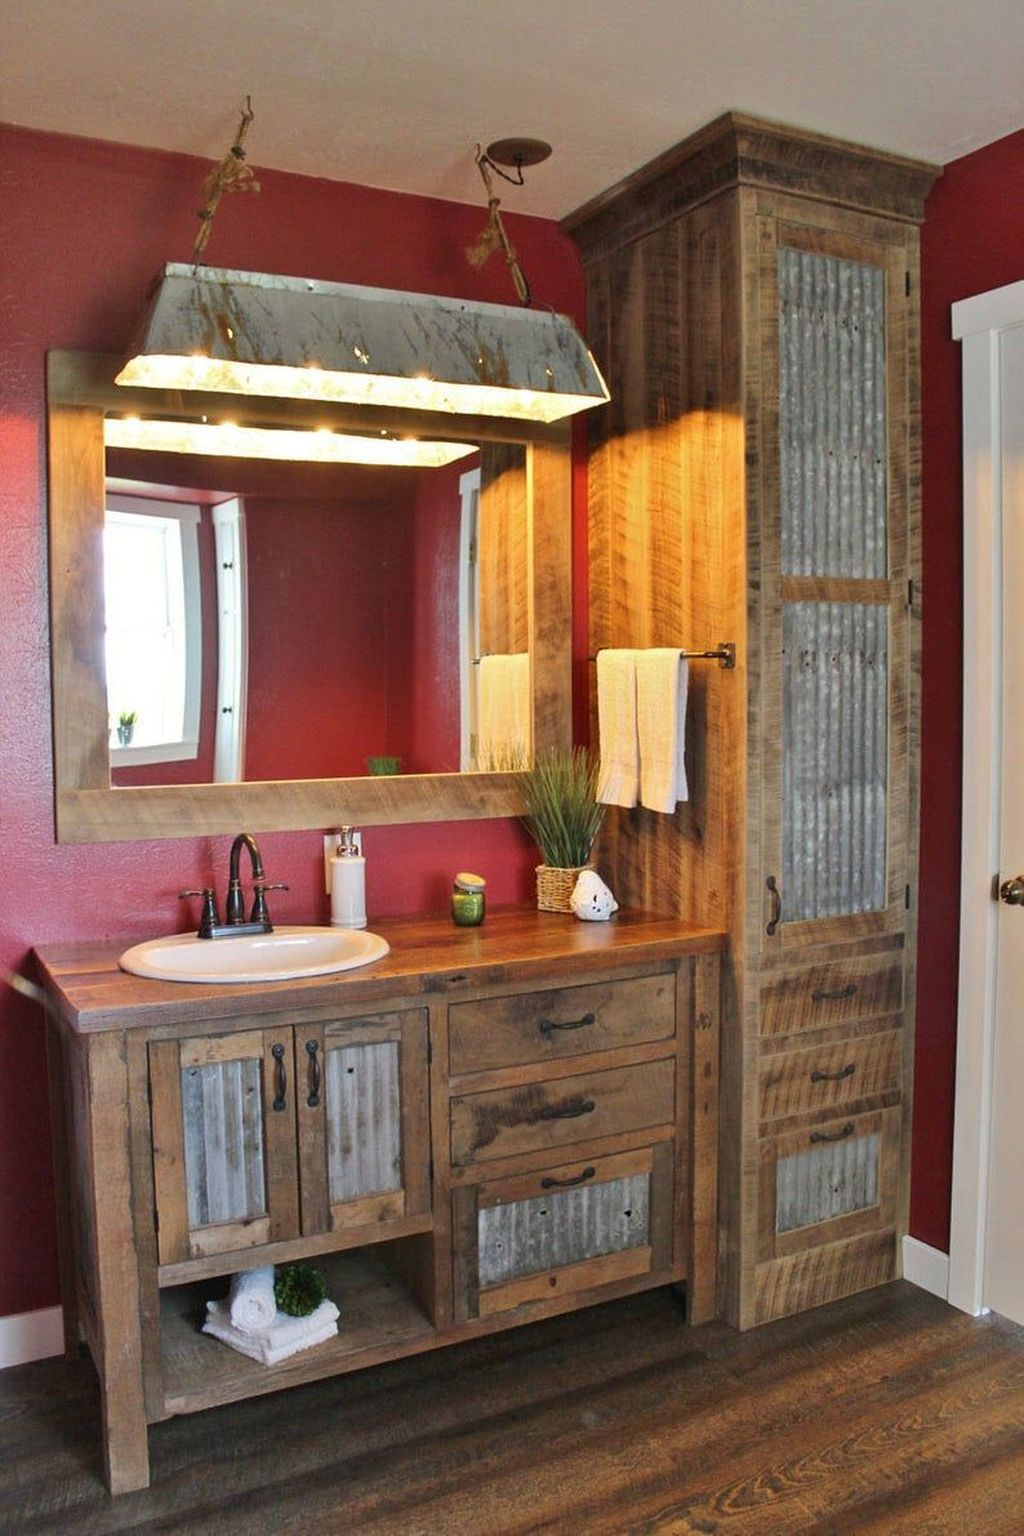 Fascinating Rustic Bathroom Decor Ideas You Must Copy 29